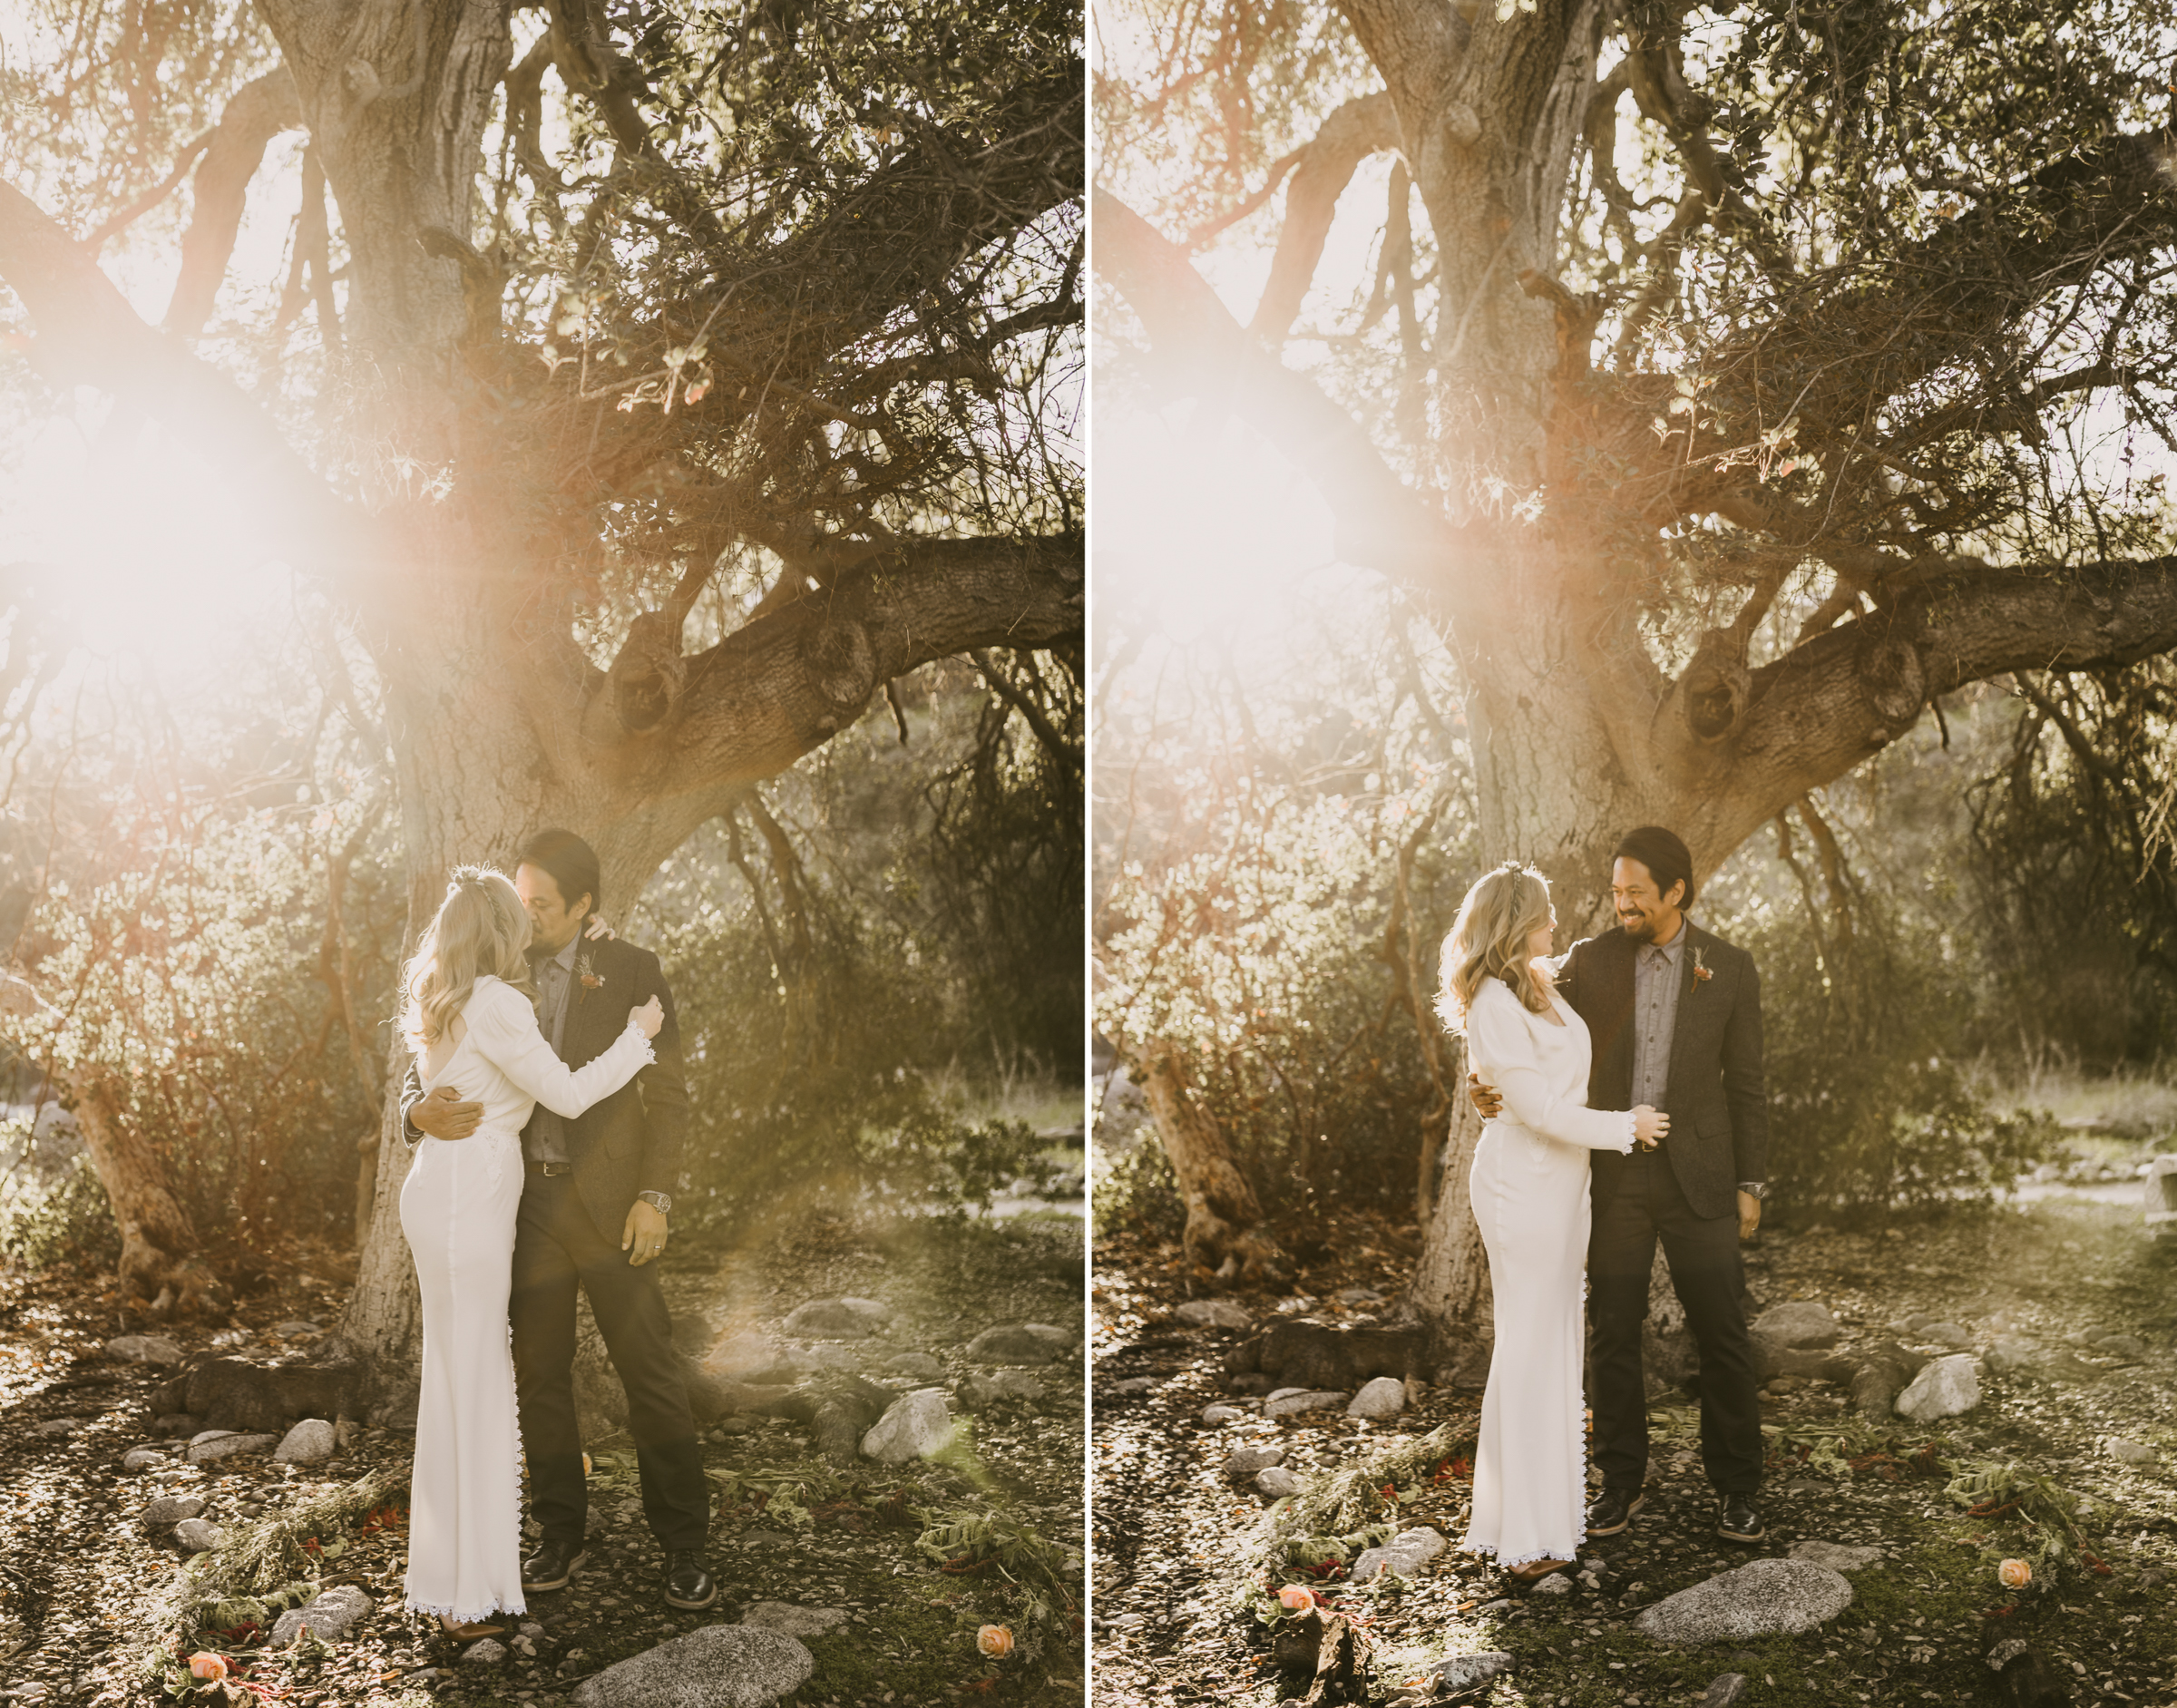 ©Isaiah + Taylor Photography - Intimate Elopement, Eaton Canyon, Los Angeles Wedding Photographer-37.jpg